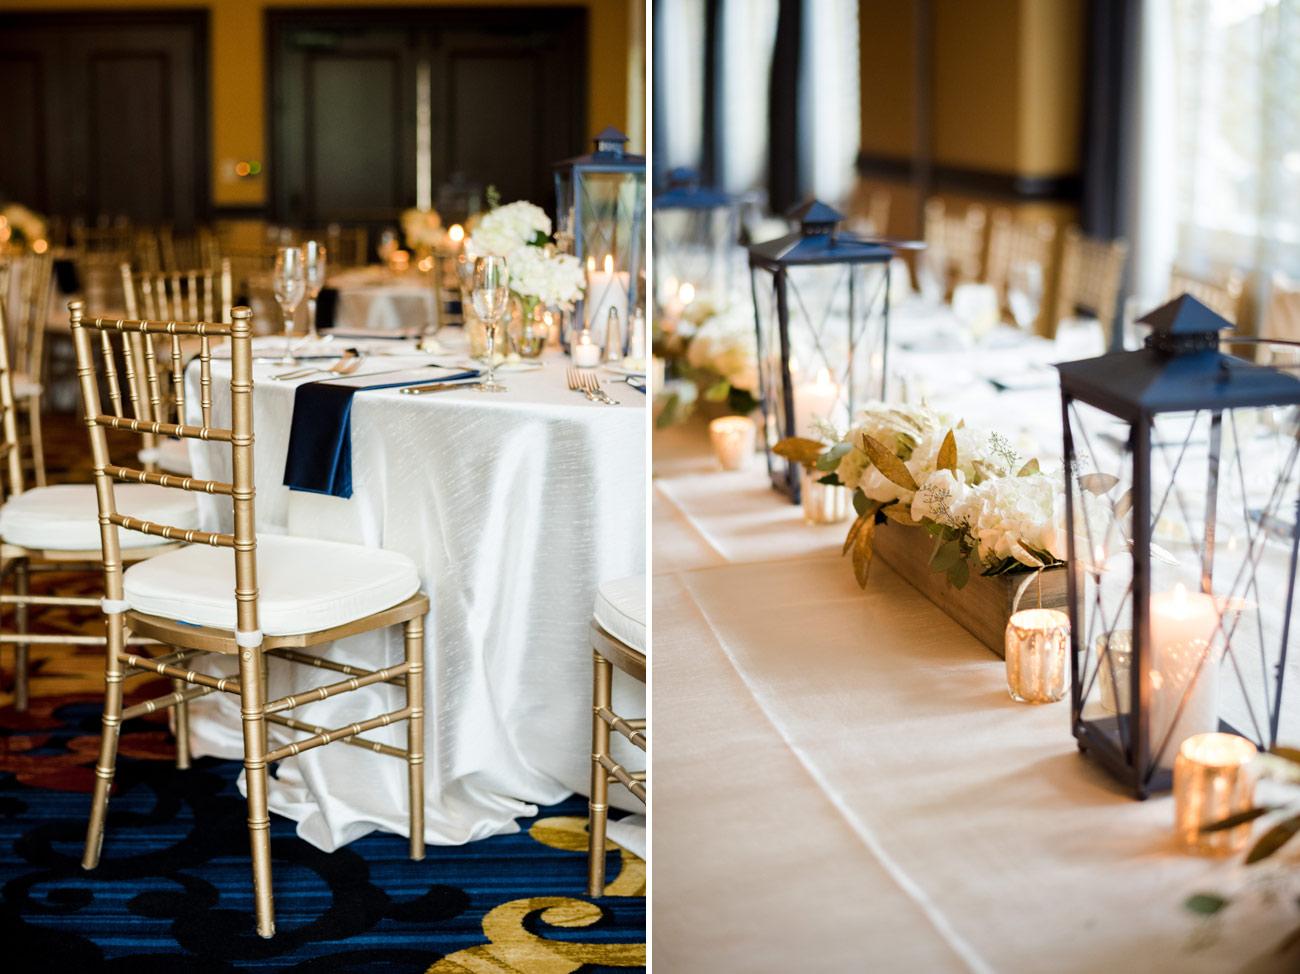 kristin_dave_hotel_marlowe_wedding_boston_34.JPG